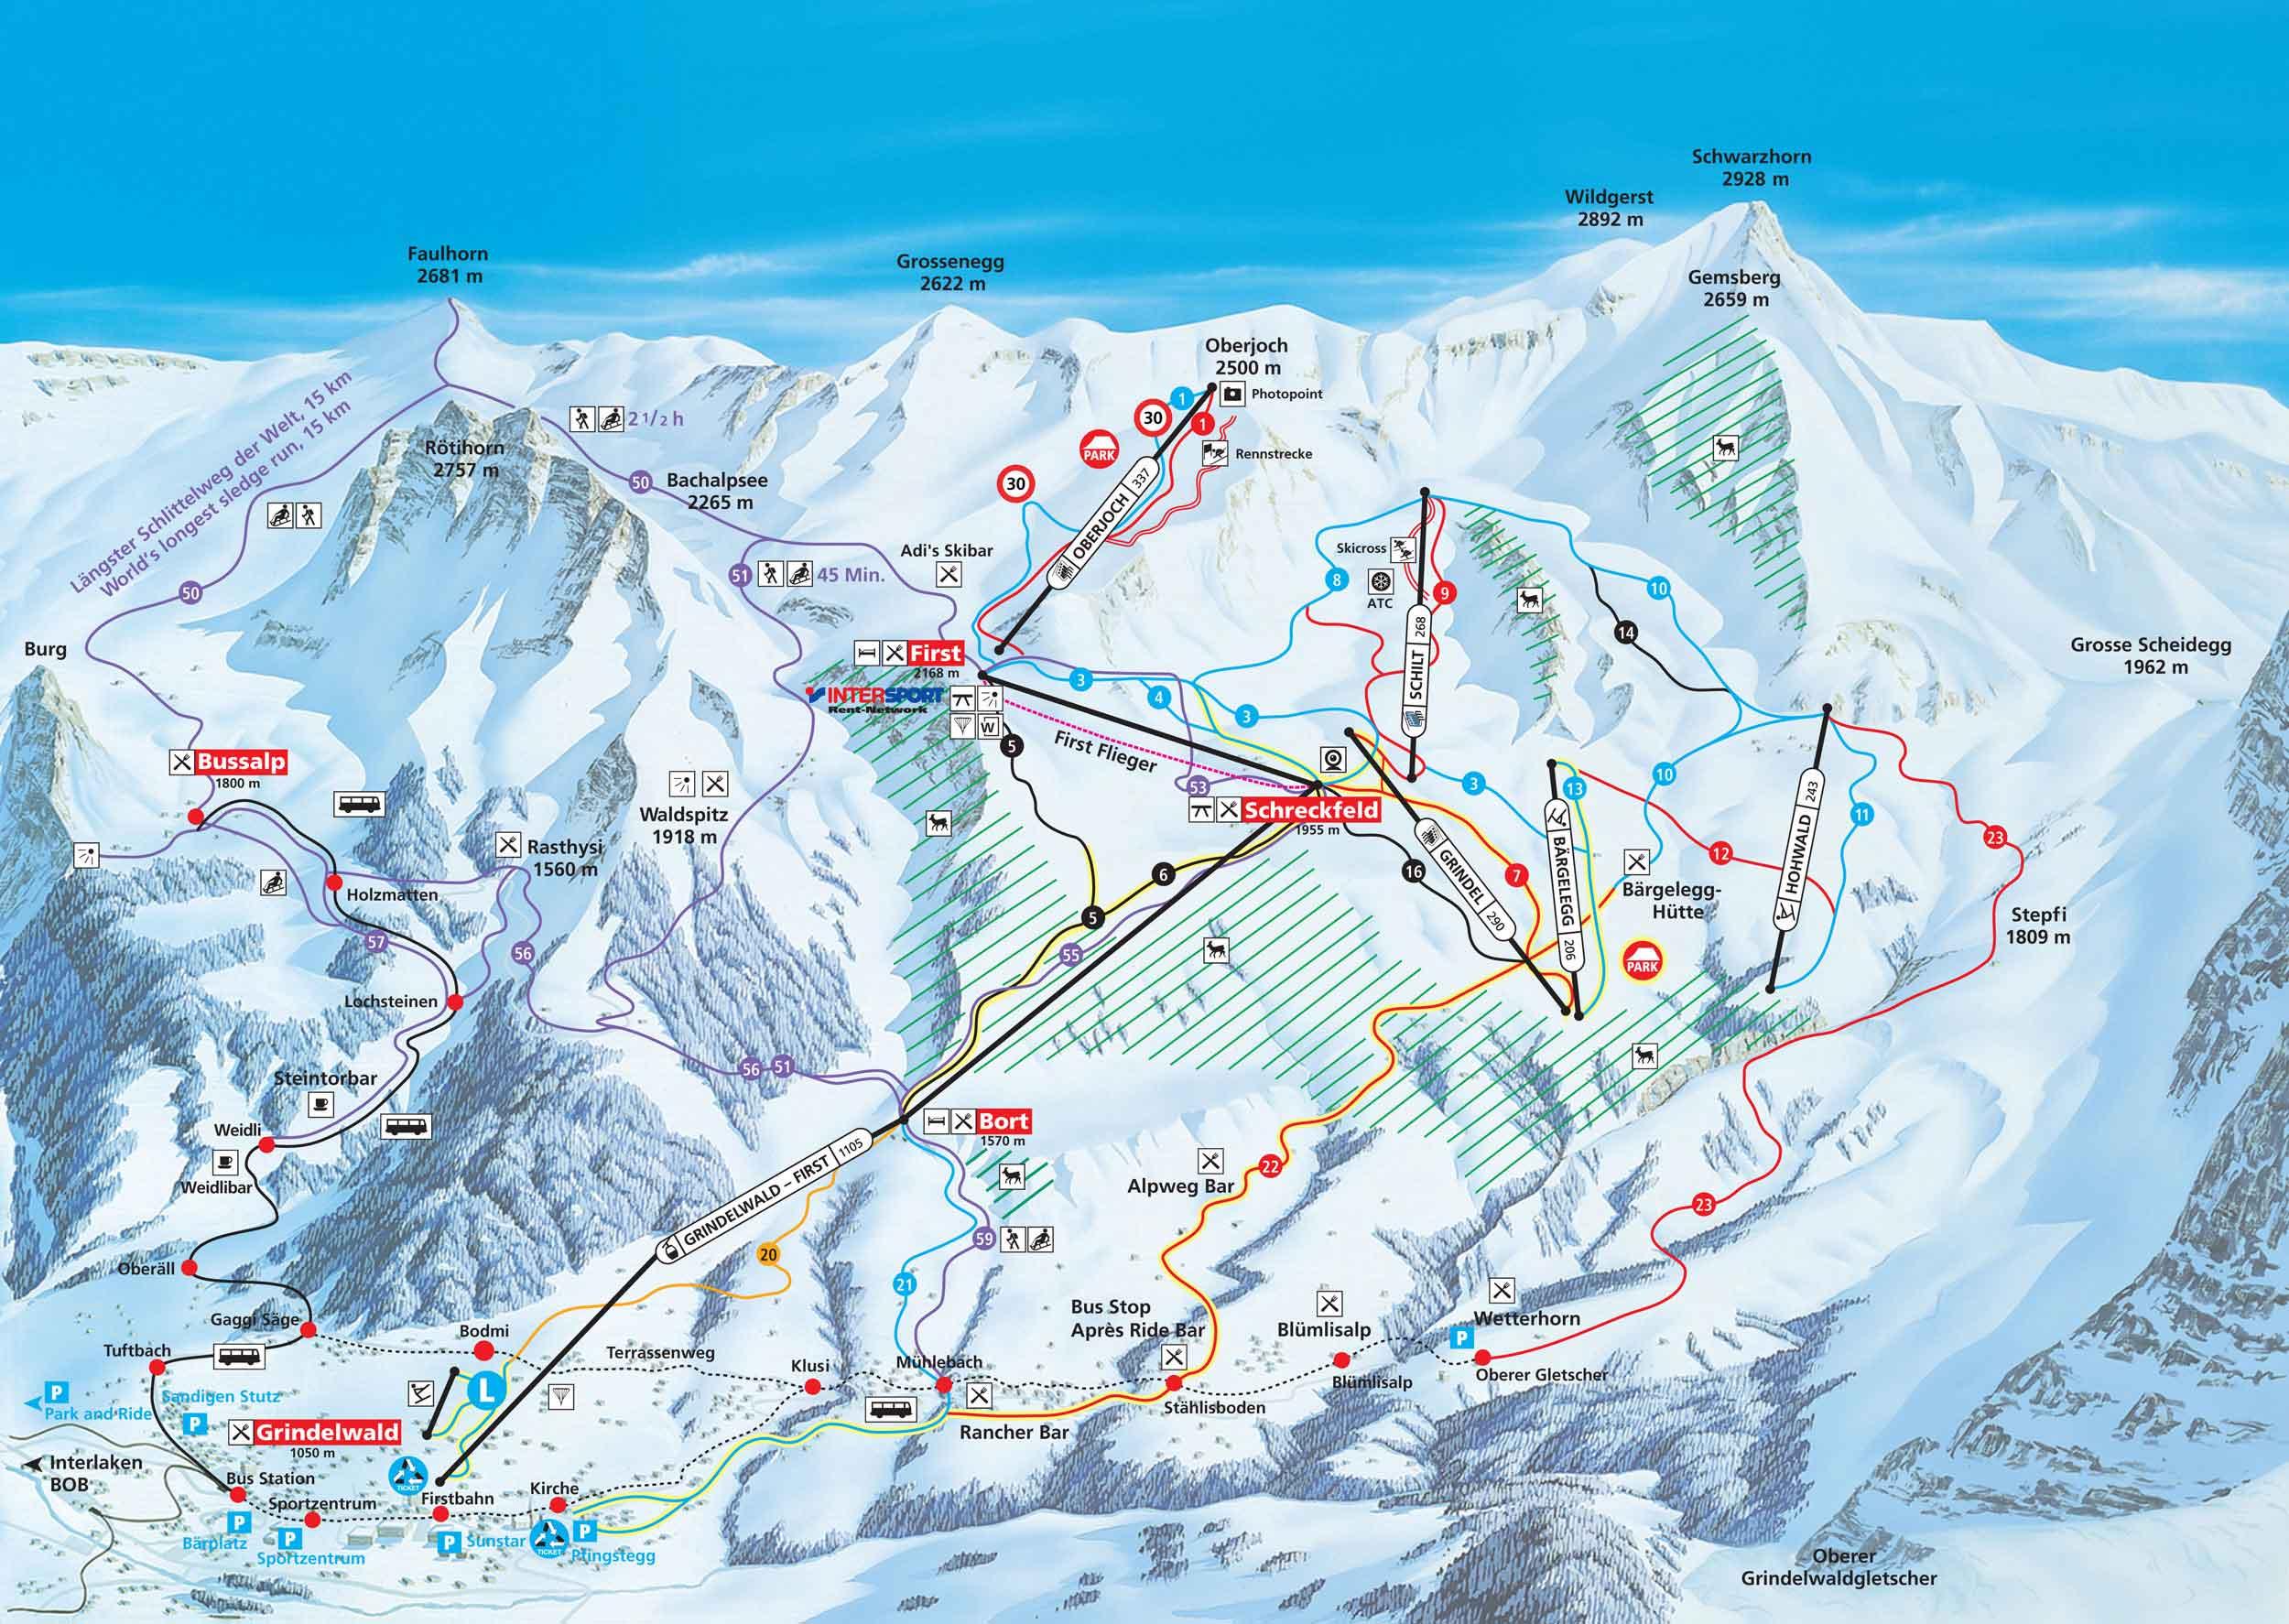 Ski map Jungfrau Region (Switzerland) Ski Resorts In Switzerland Map on map zermatt, map cities in switzerland, map ski resorts in france, map hotels in switzerland,